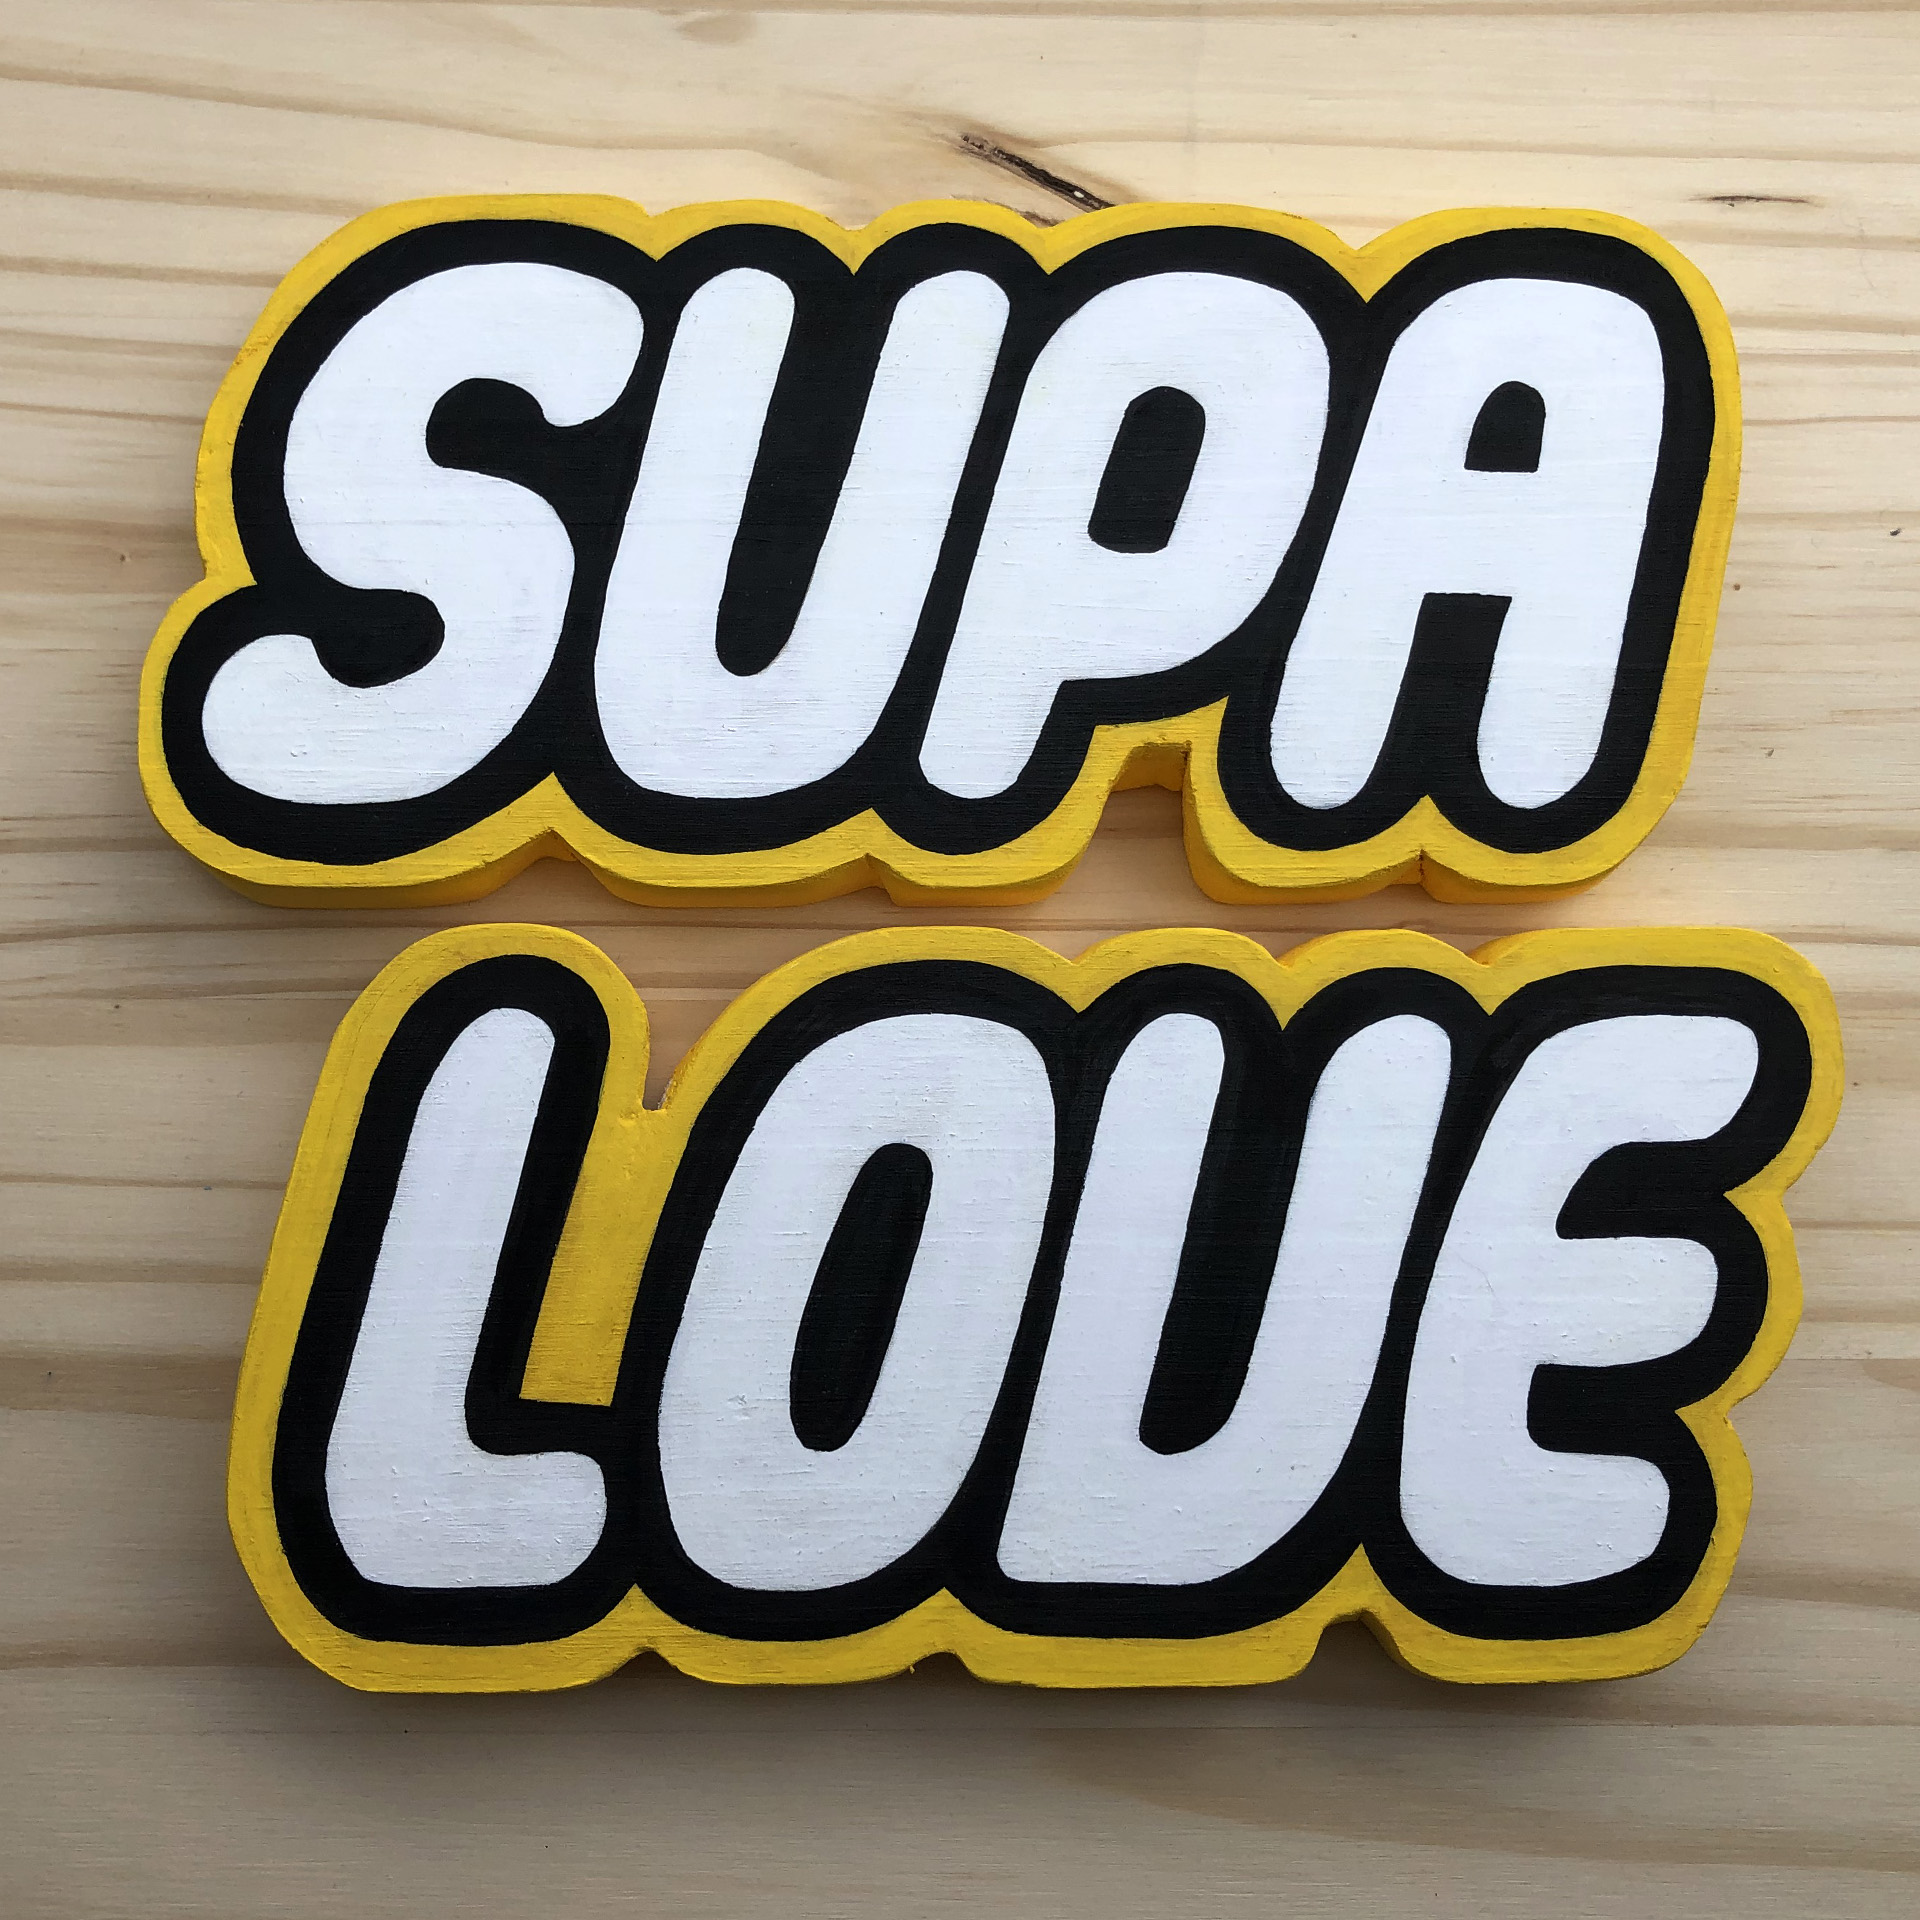 Supacat street art - Supagraff in wood